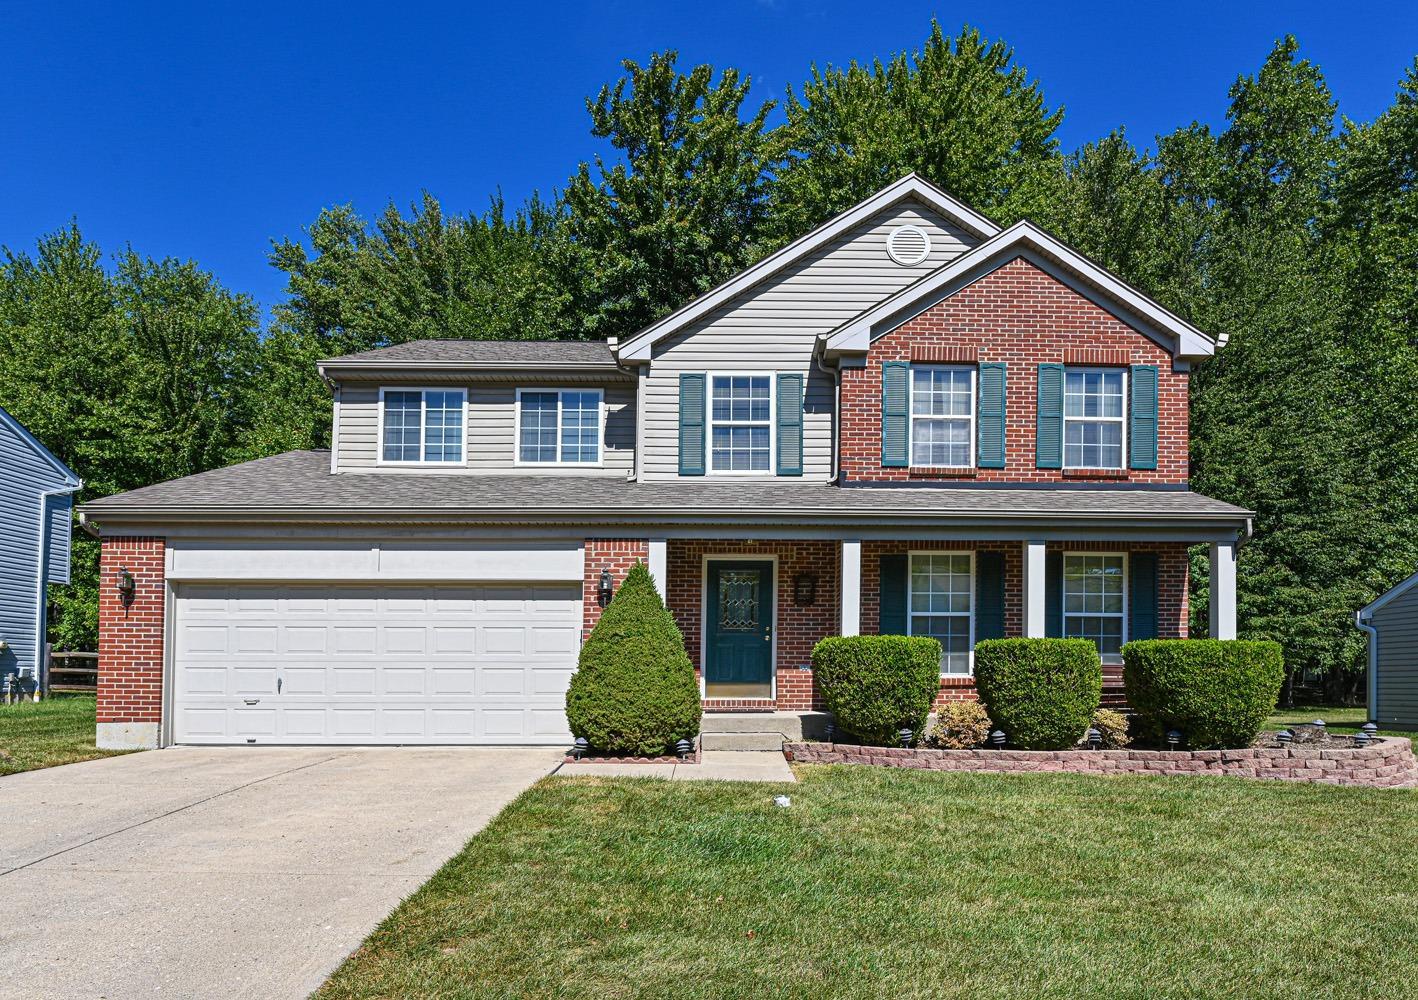 Property for sale at 1510 Creekside Road, Batavia Twp,  Ohio 45102